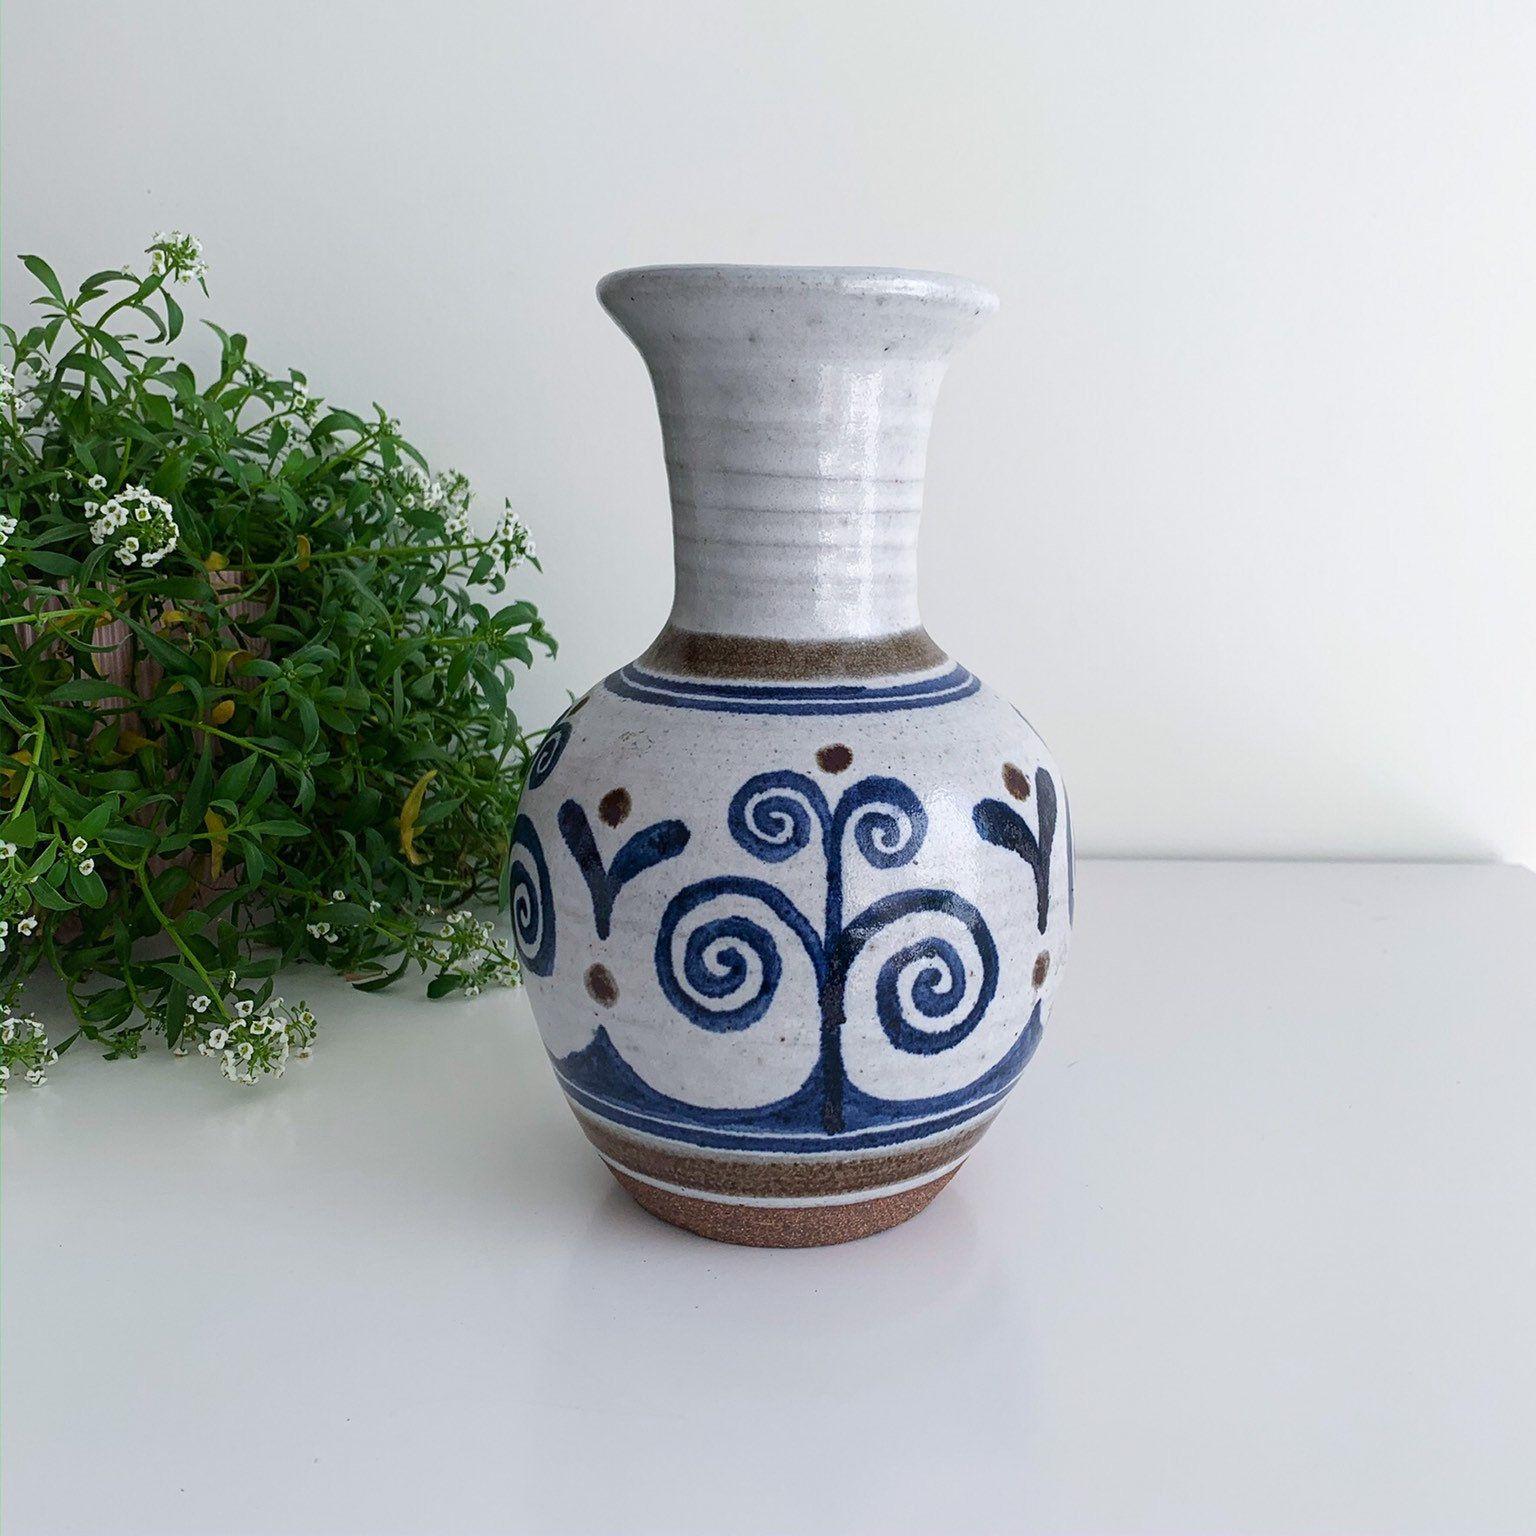 Vintage Stoneware Vase With Handpainted Design Handmade Art Pottery Ceramic Vase Mid Century Scandinavian Pottery Art Stoneware Vase Scandinavian Ceramic